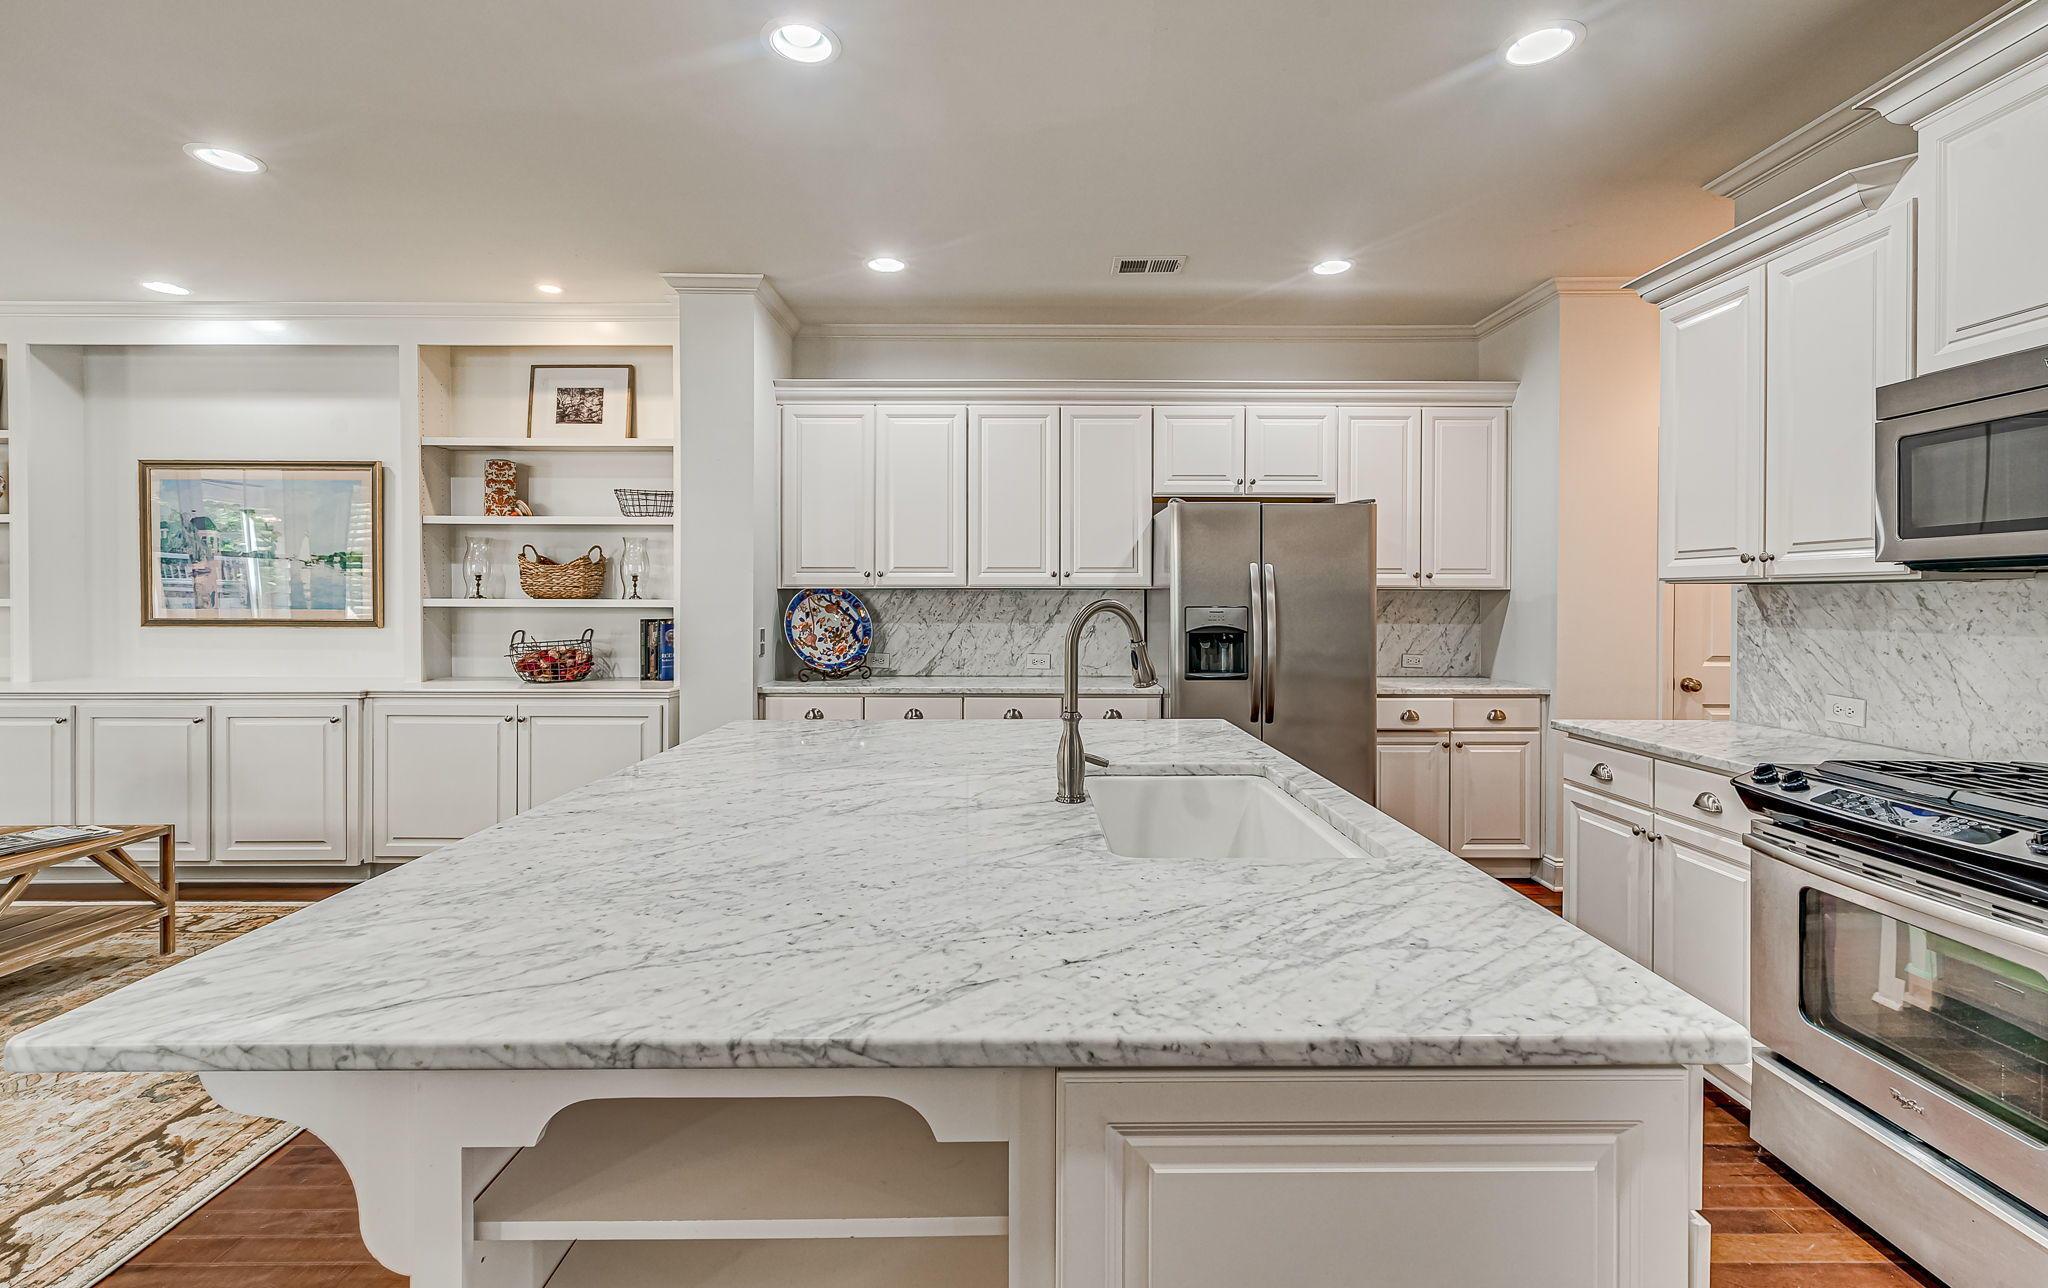 Dunes West Homes For Sale - 2476 Kings Gate, Mount Pleasant, SC - 49